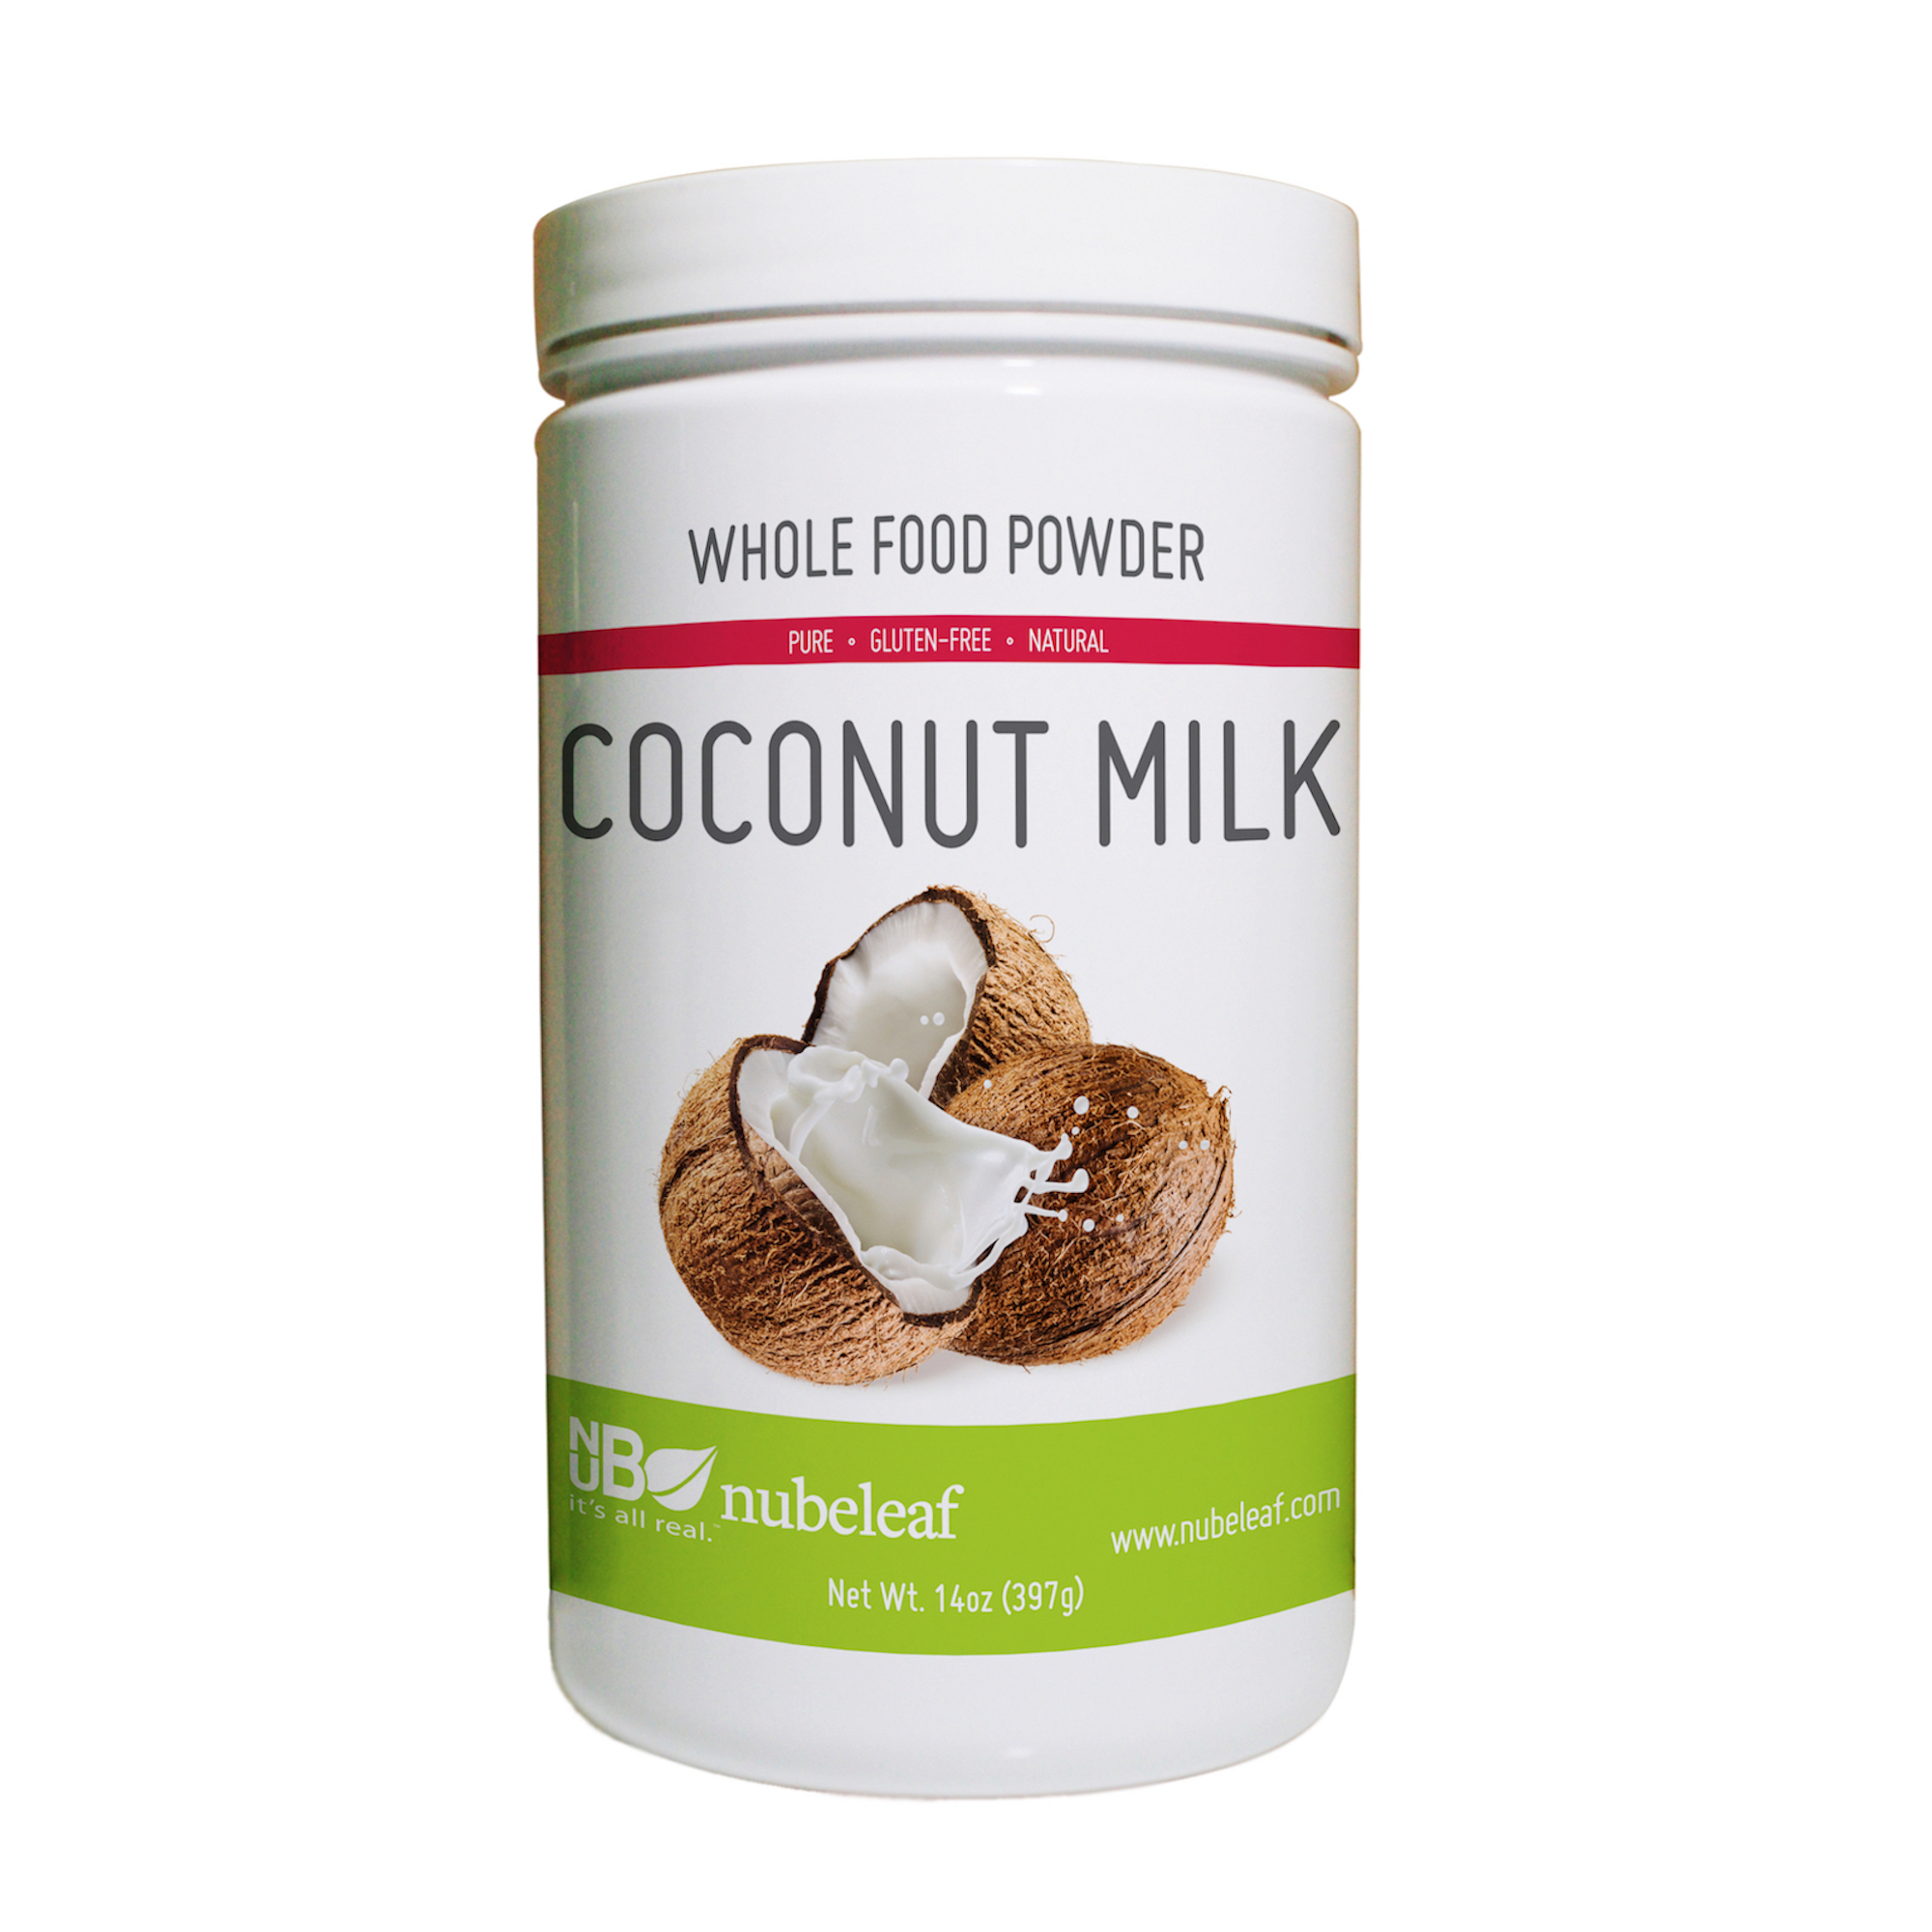 Coconut Milk_C_Large_Jar_Only_2019.jpg